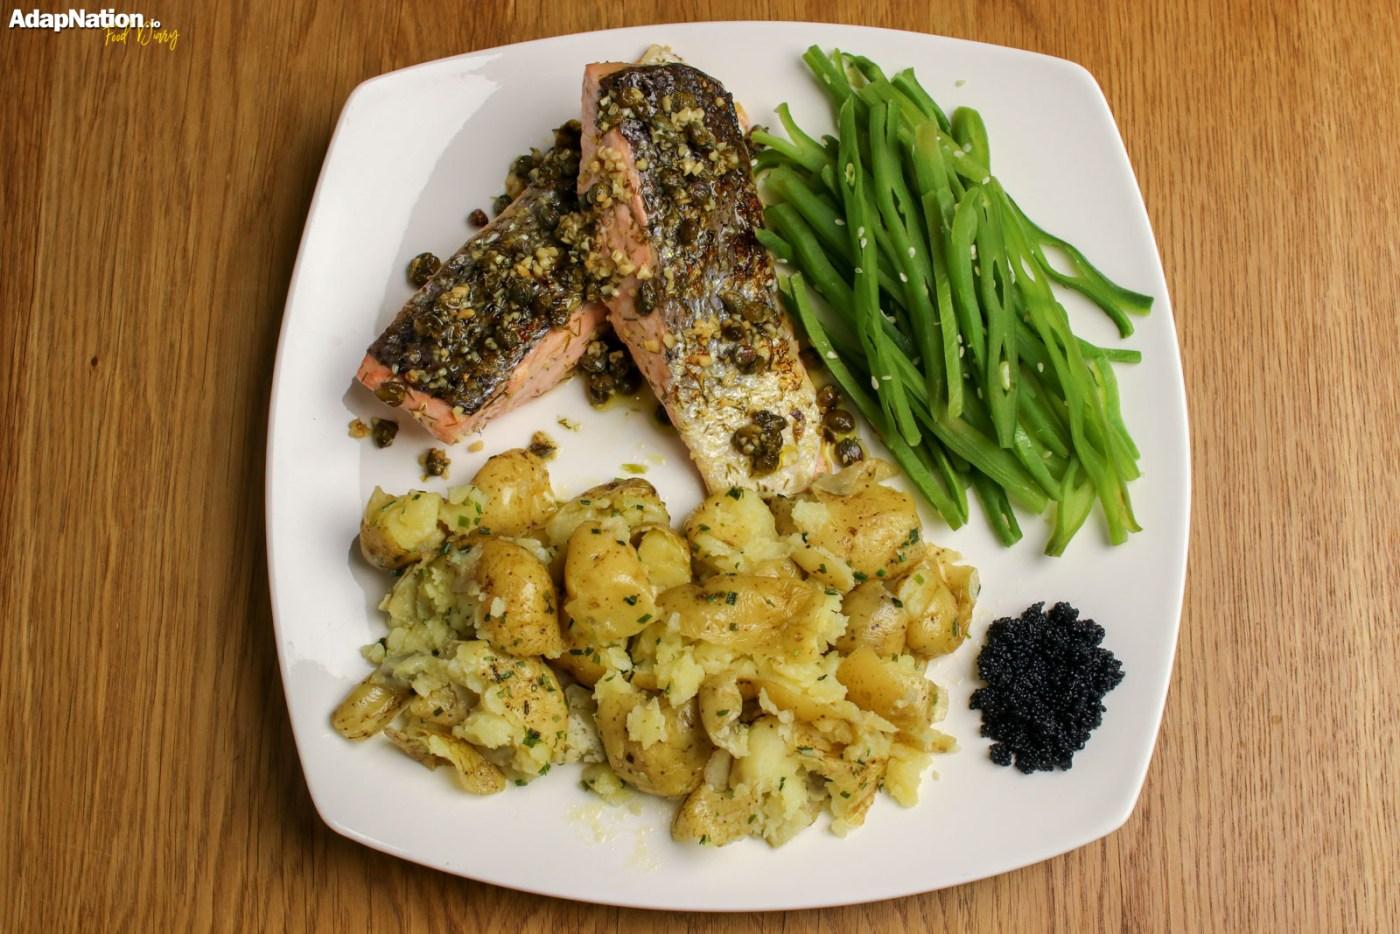 Caper, Dill & Lemon Salmon with Crushed Potatoes & Seaweed Caviar